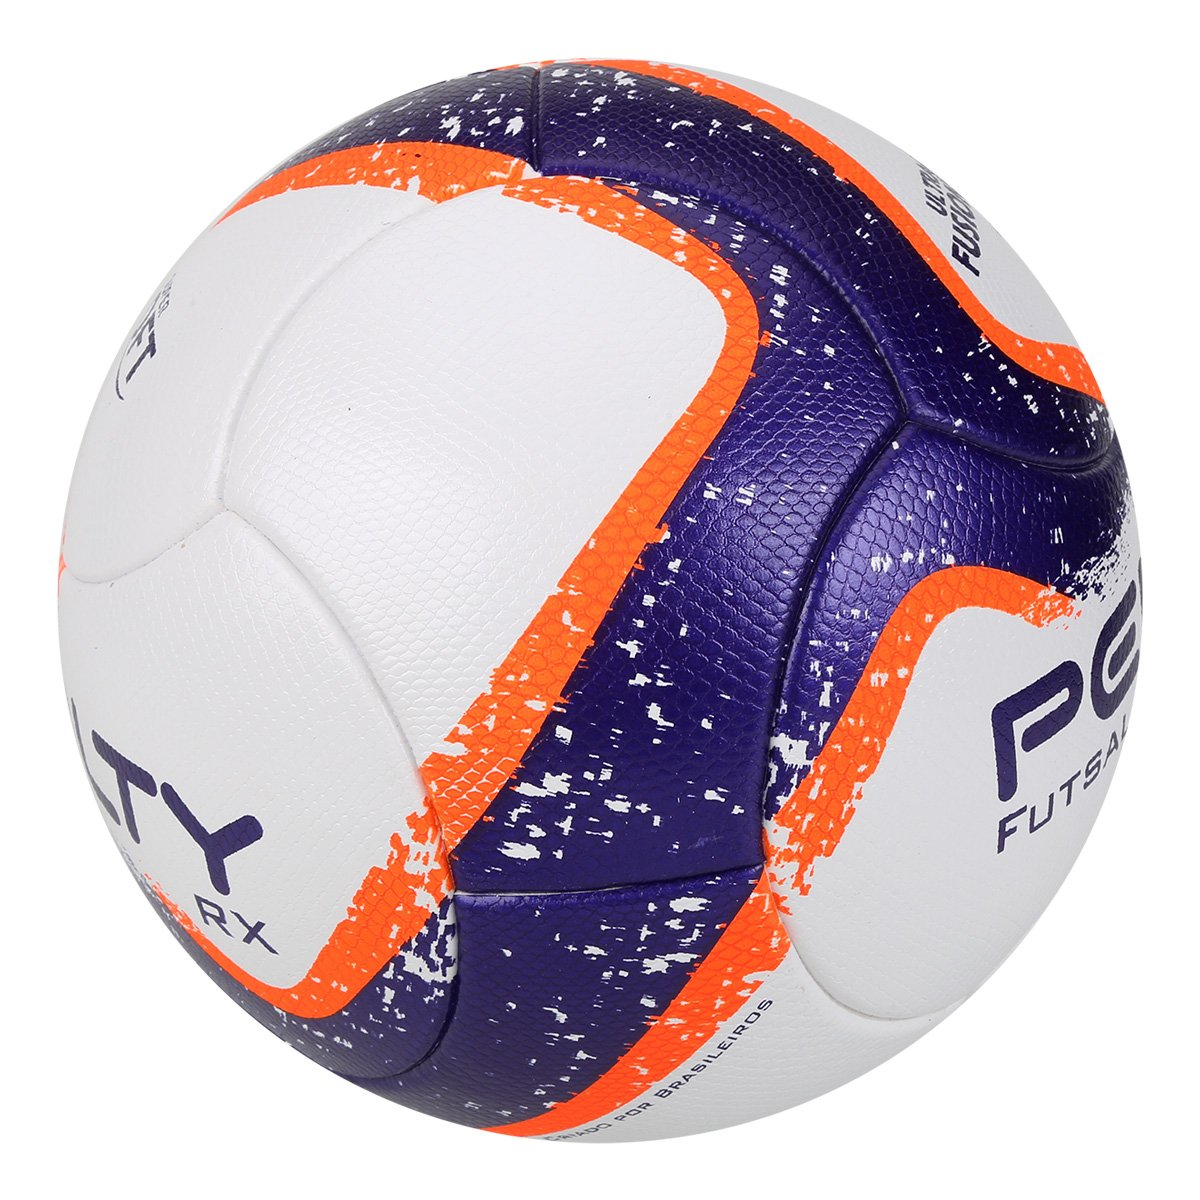 ea128b5a25 Bola Futsal Penalty RX 500 R1 Fusion VIII - Compre Agora